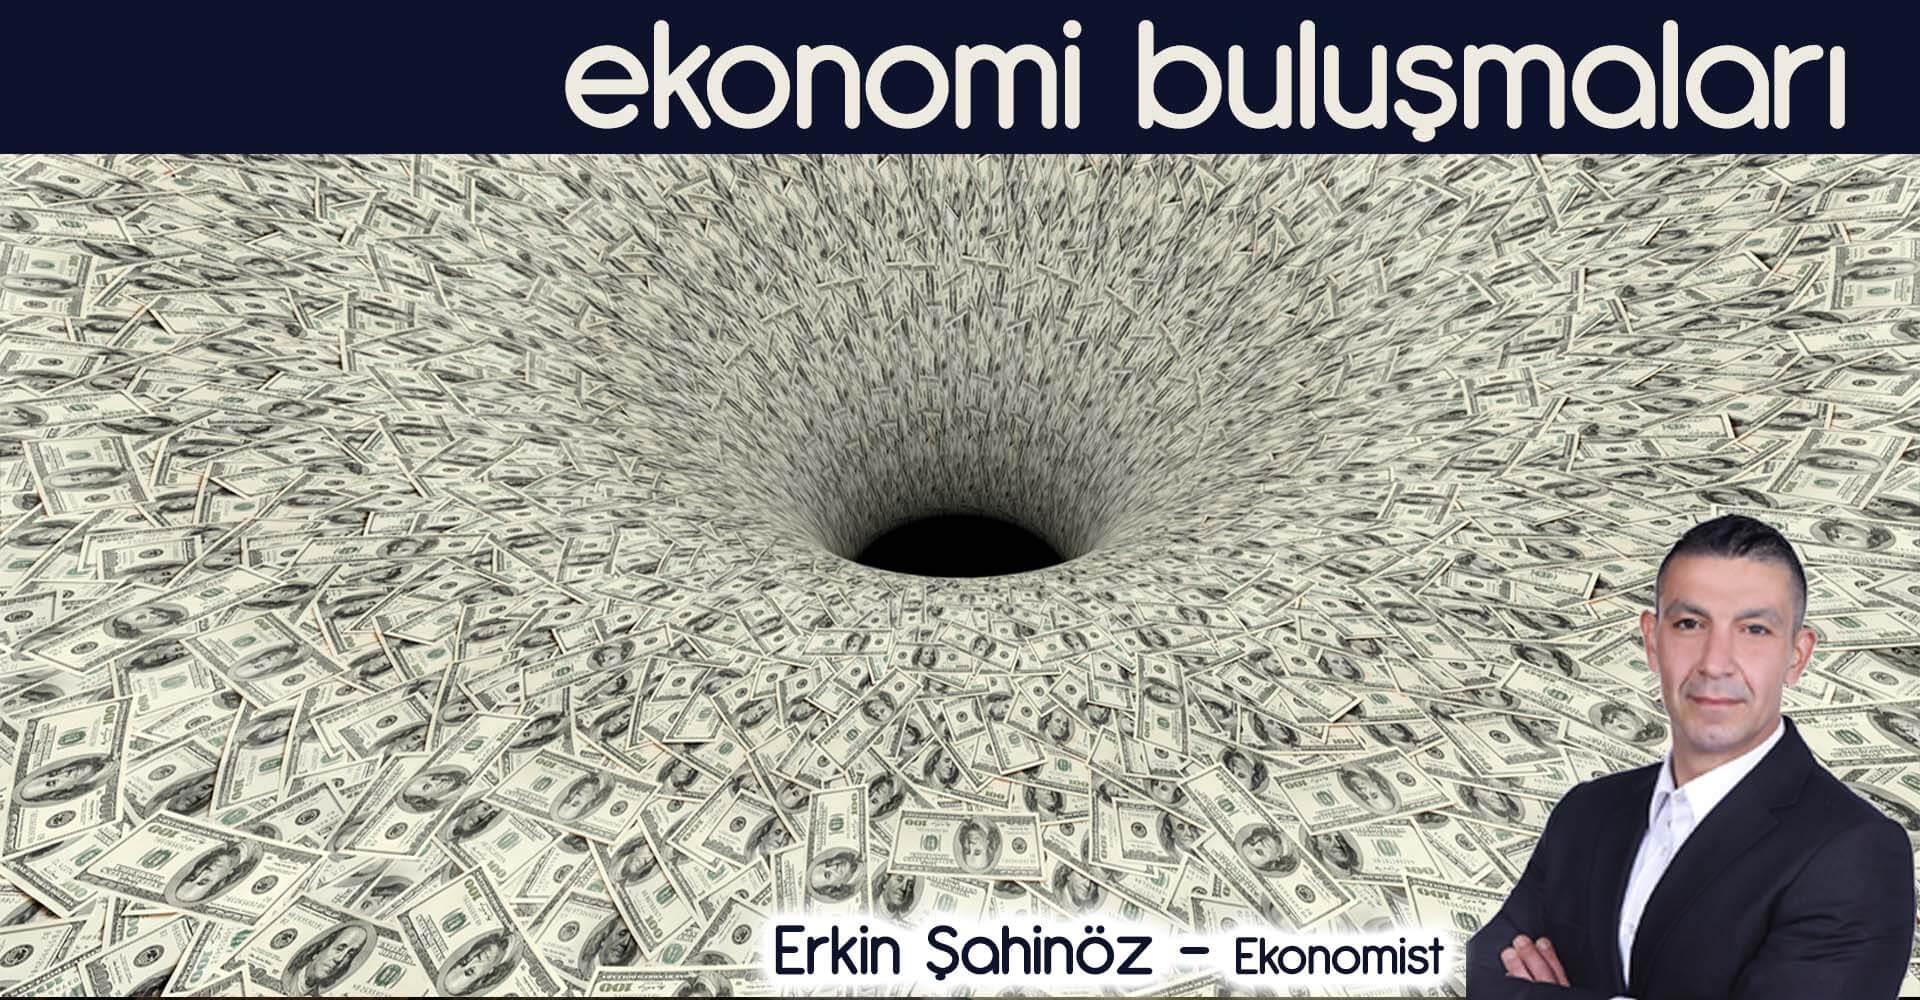 Erkin Sahinoz Slider